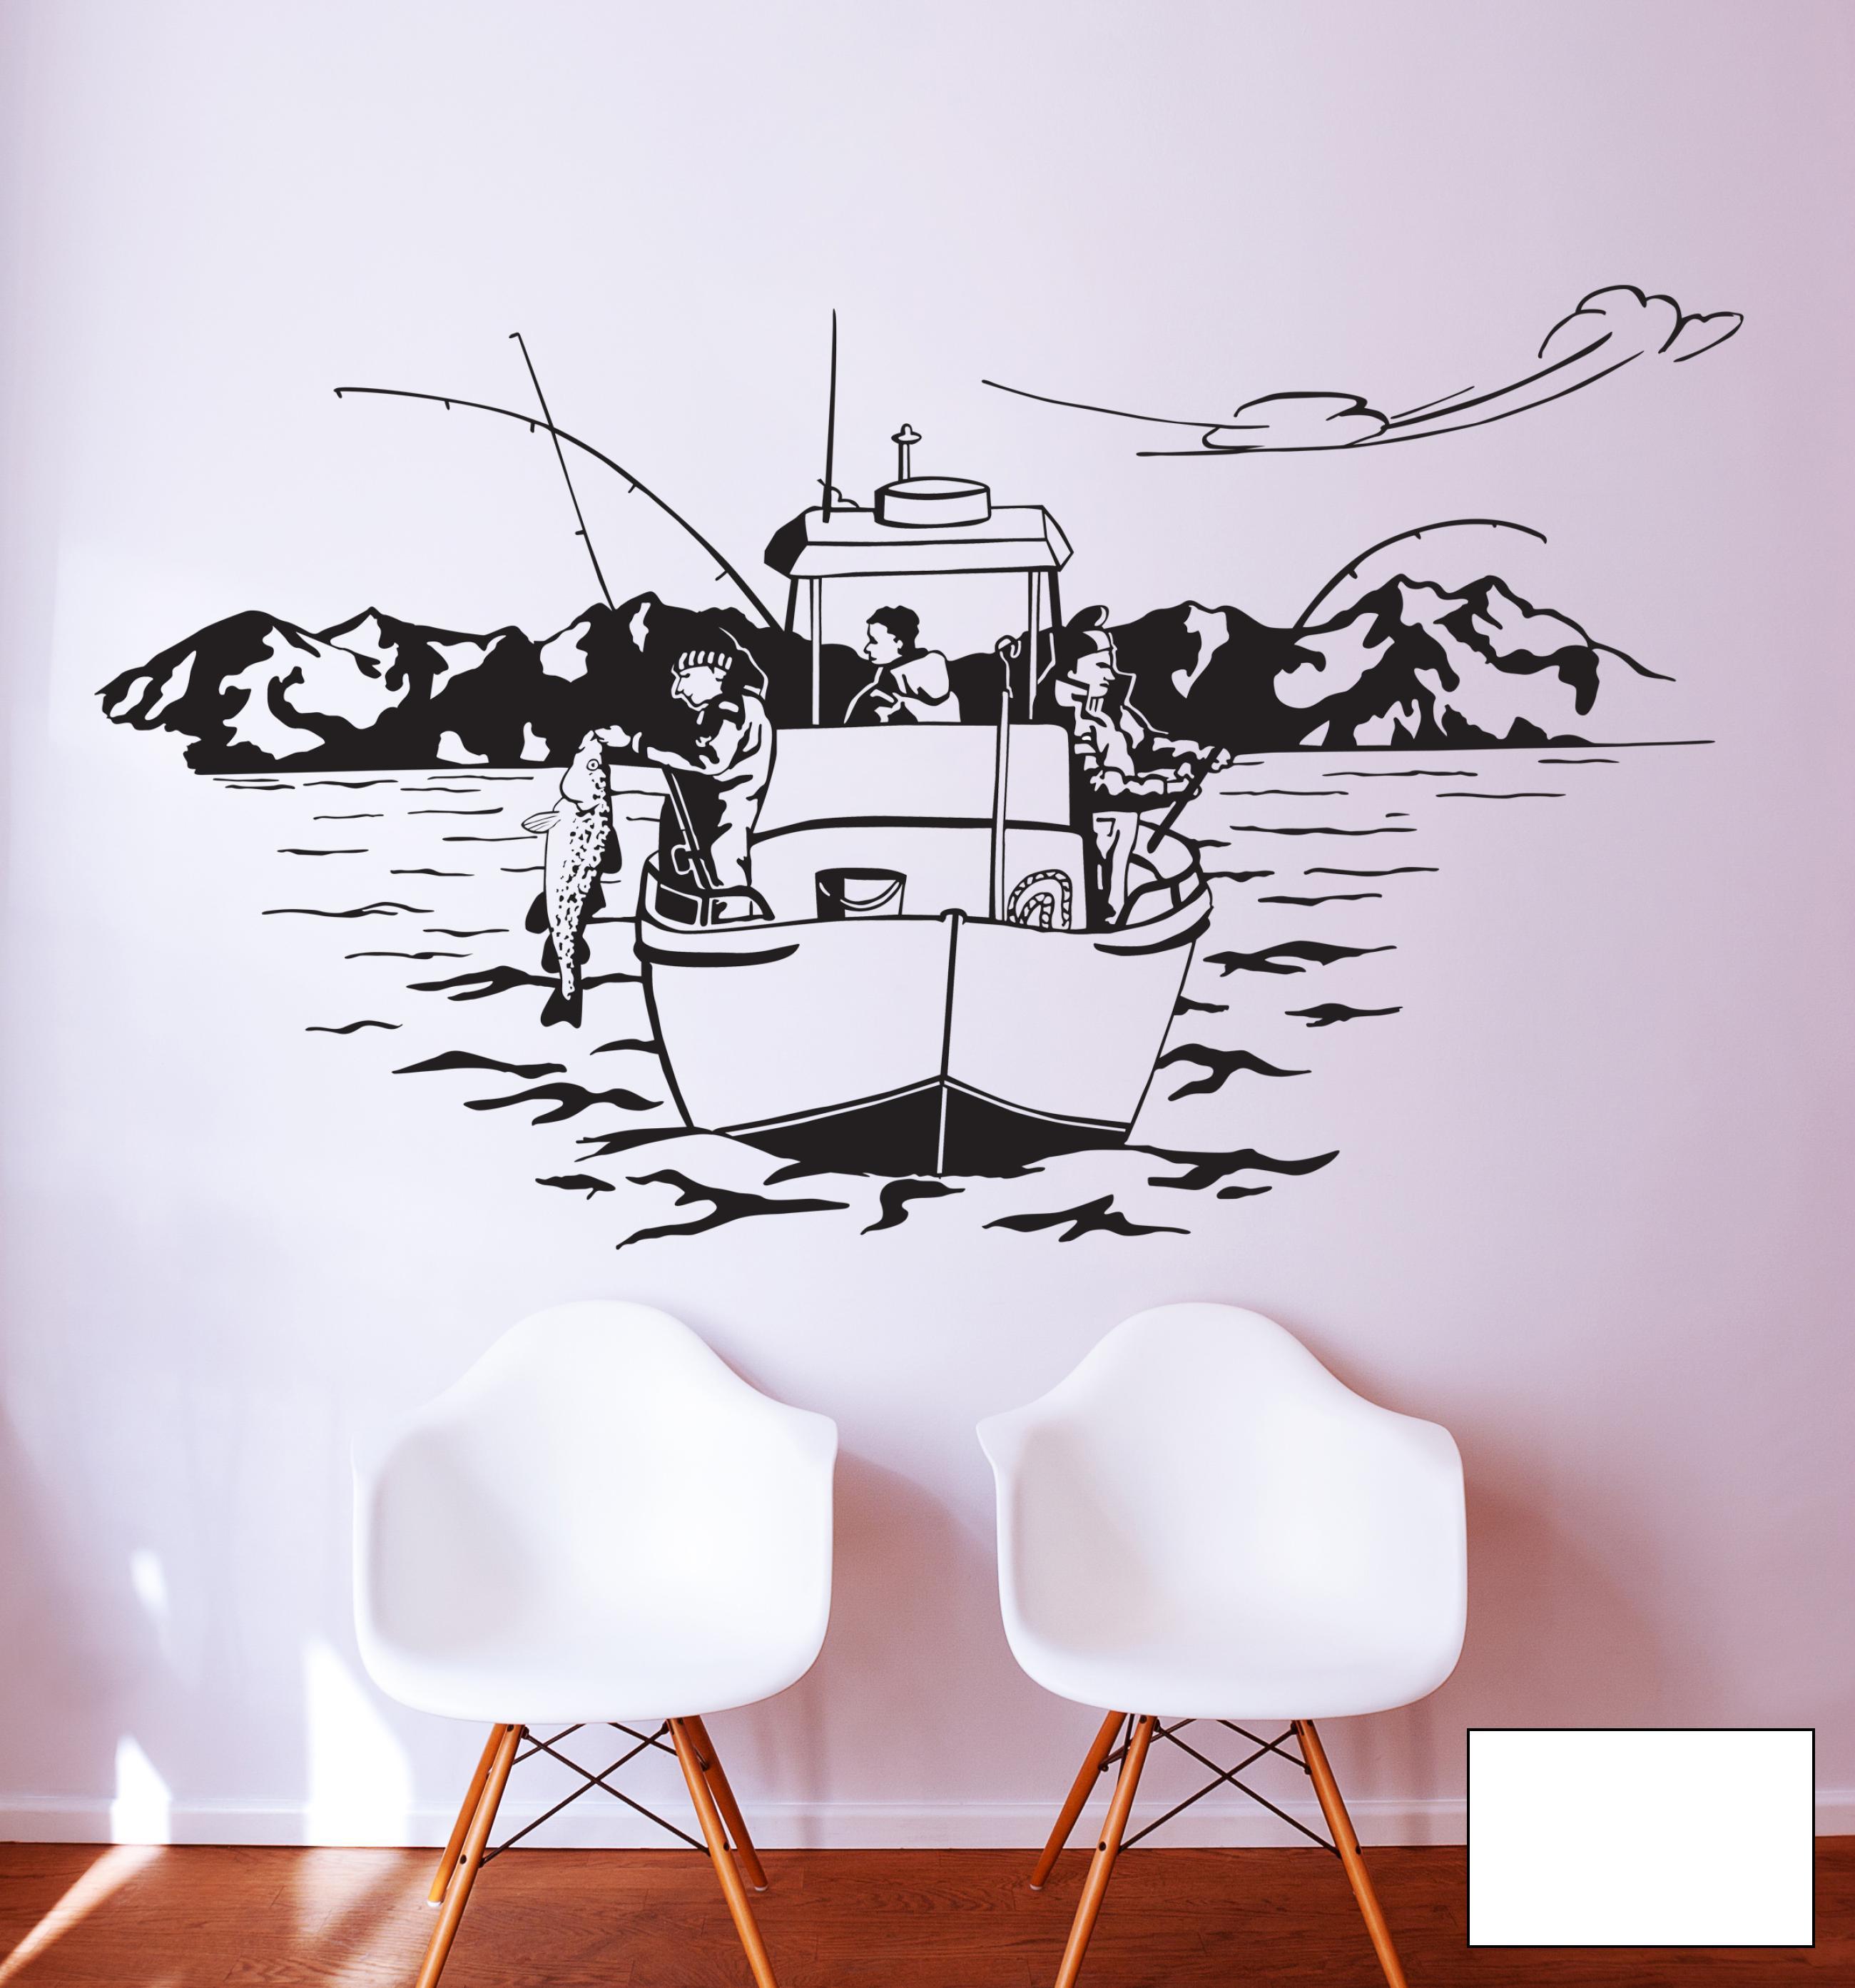 Wandtattoo angler angelboot norwegen see boot m1454 ebay - Ebay wandtattoo ...